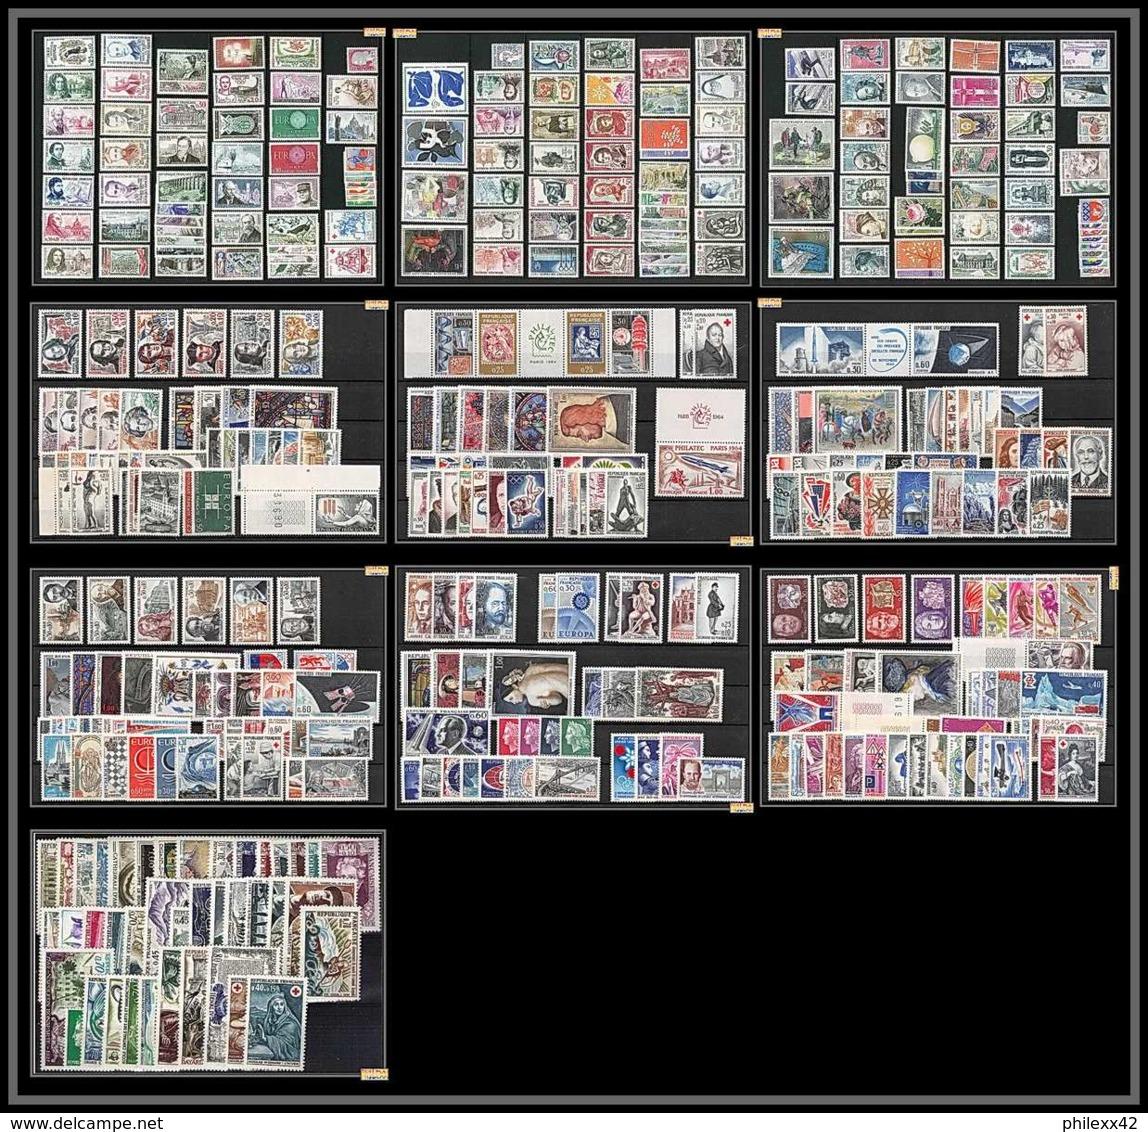 Départ 1 EURO - FRANCE COMPLET 1960 / 1969 NEUF ** A SAISIR  COTE 388 EUROS VOIR SCANS - ....-1939